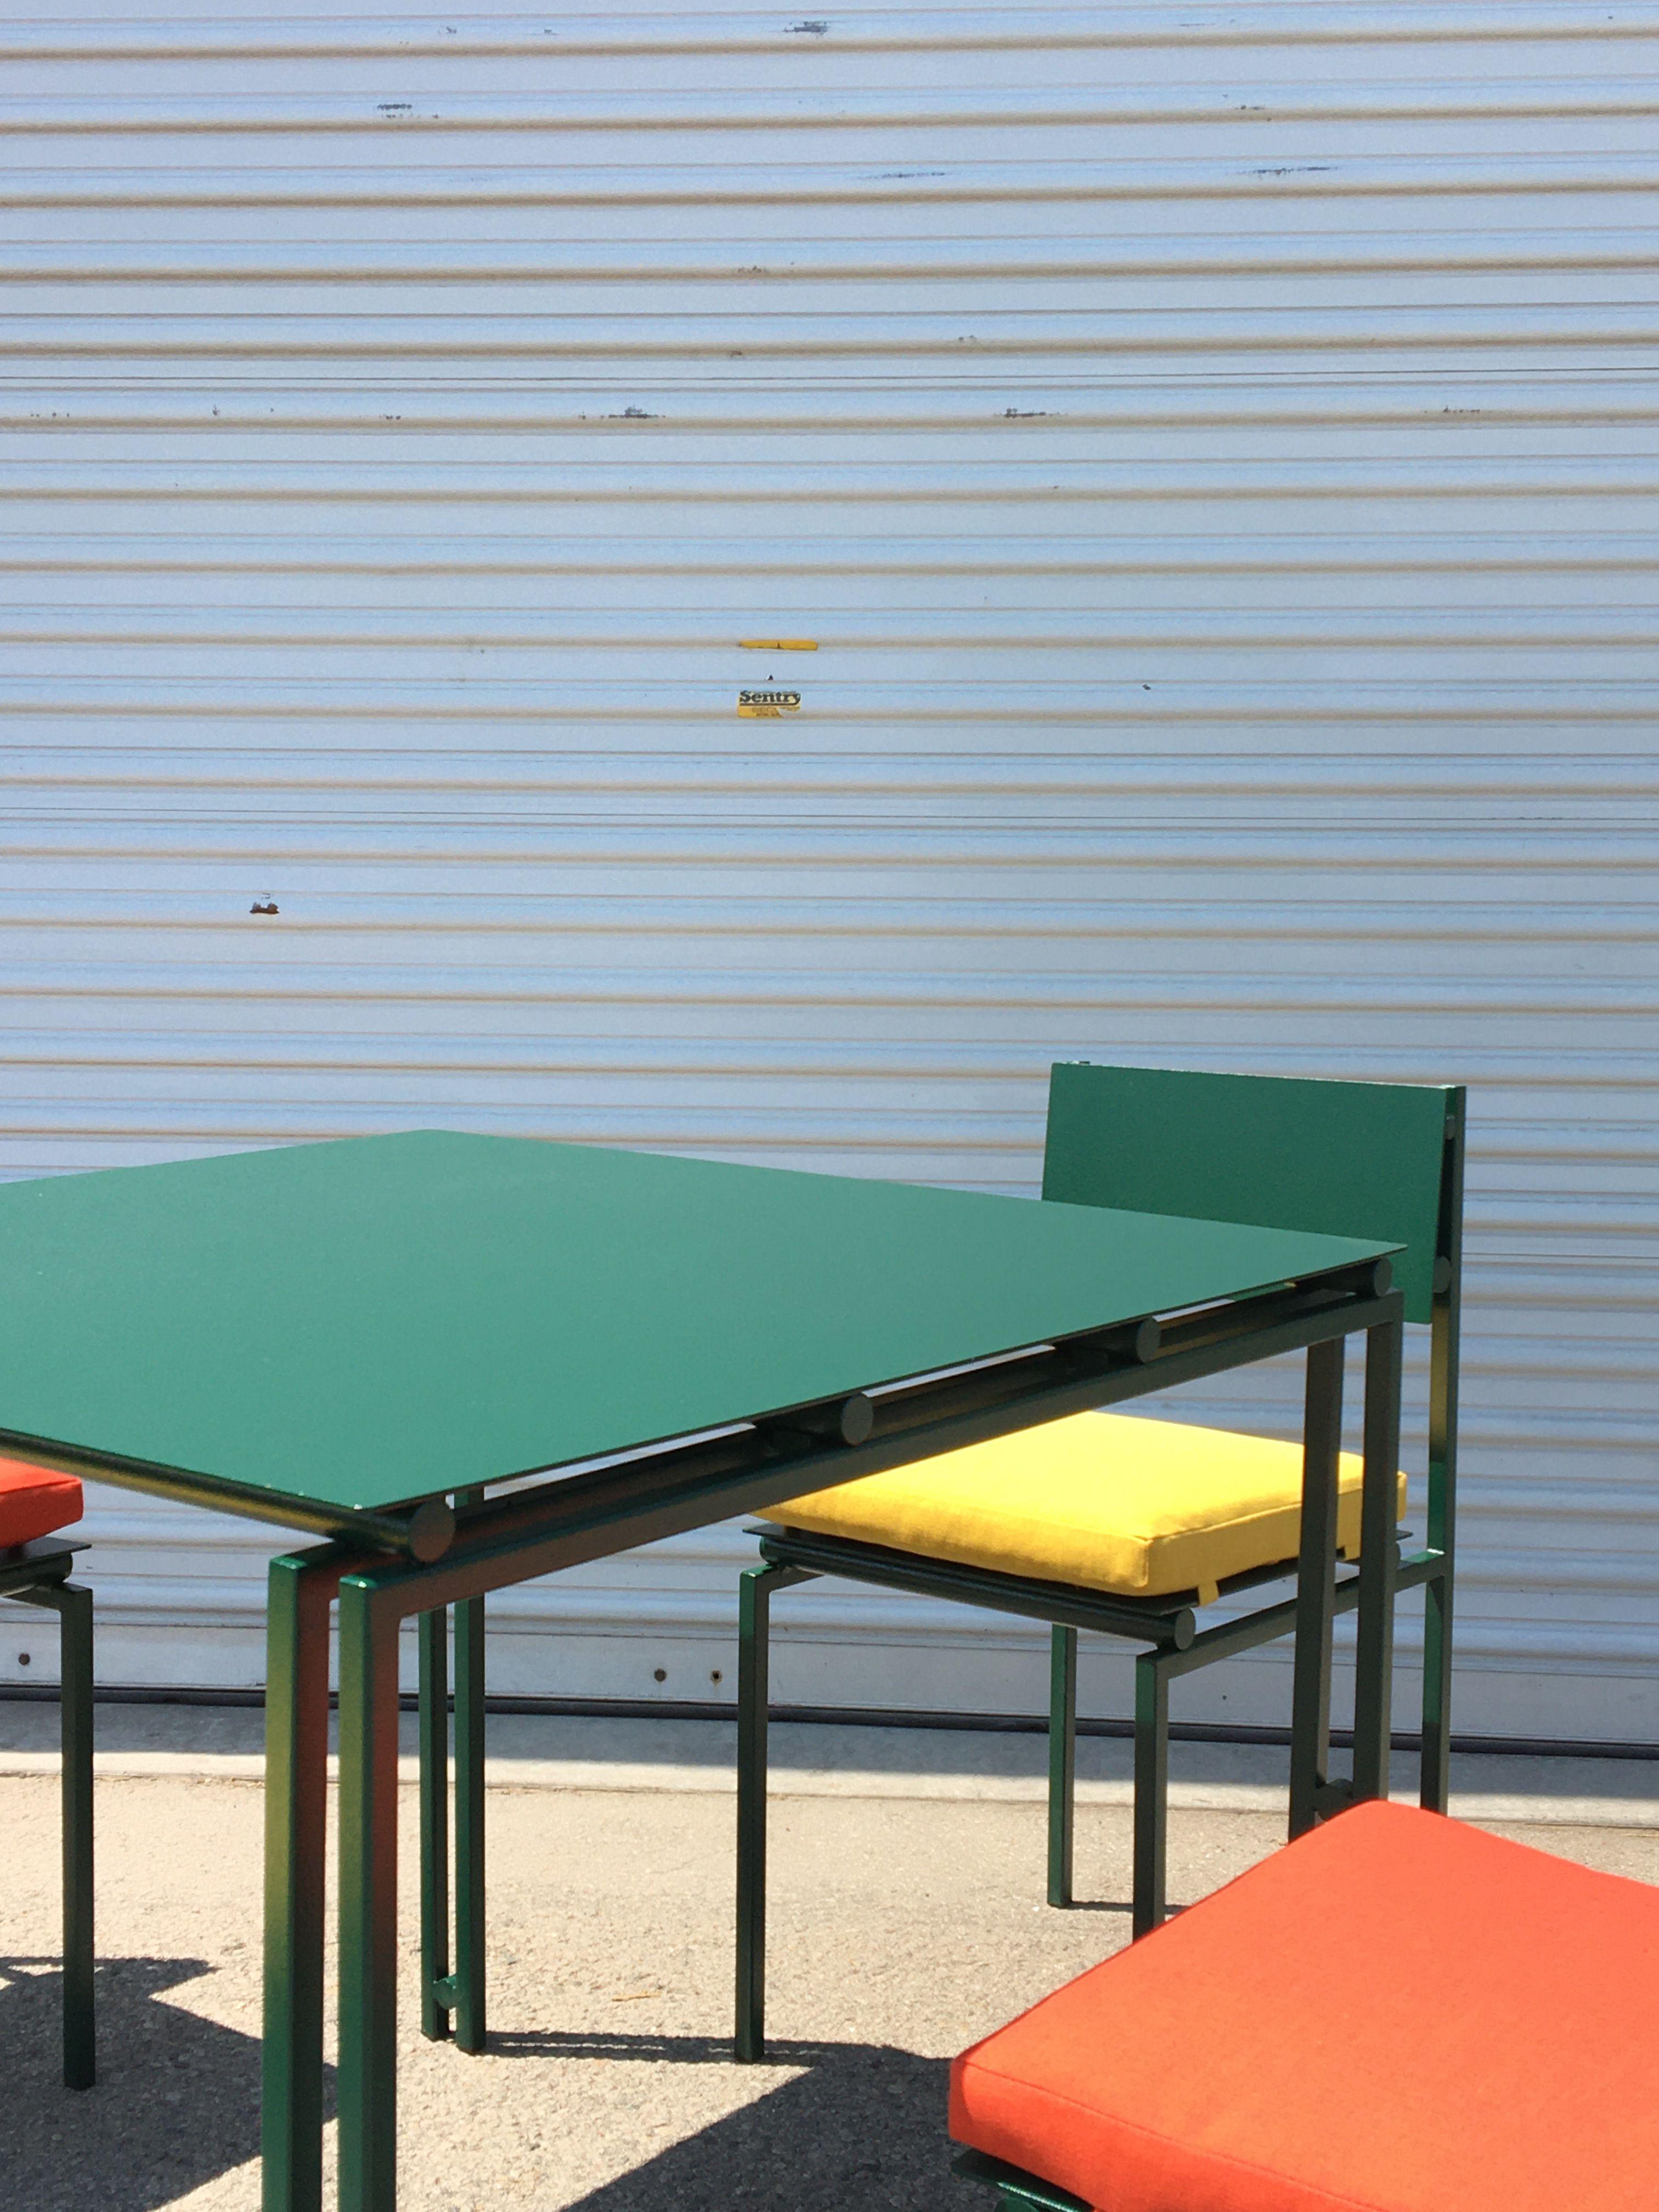 Suspension Metal Set - Breakfast Size product image 9